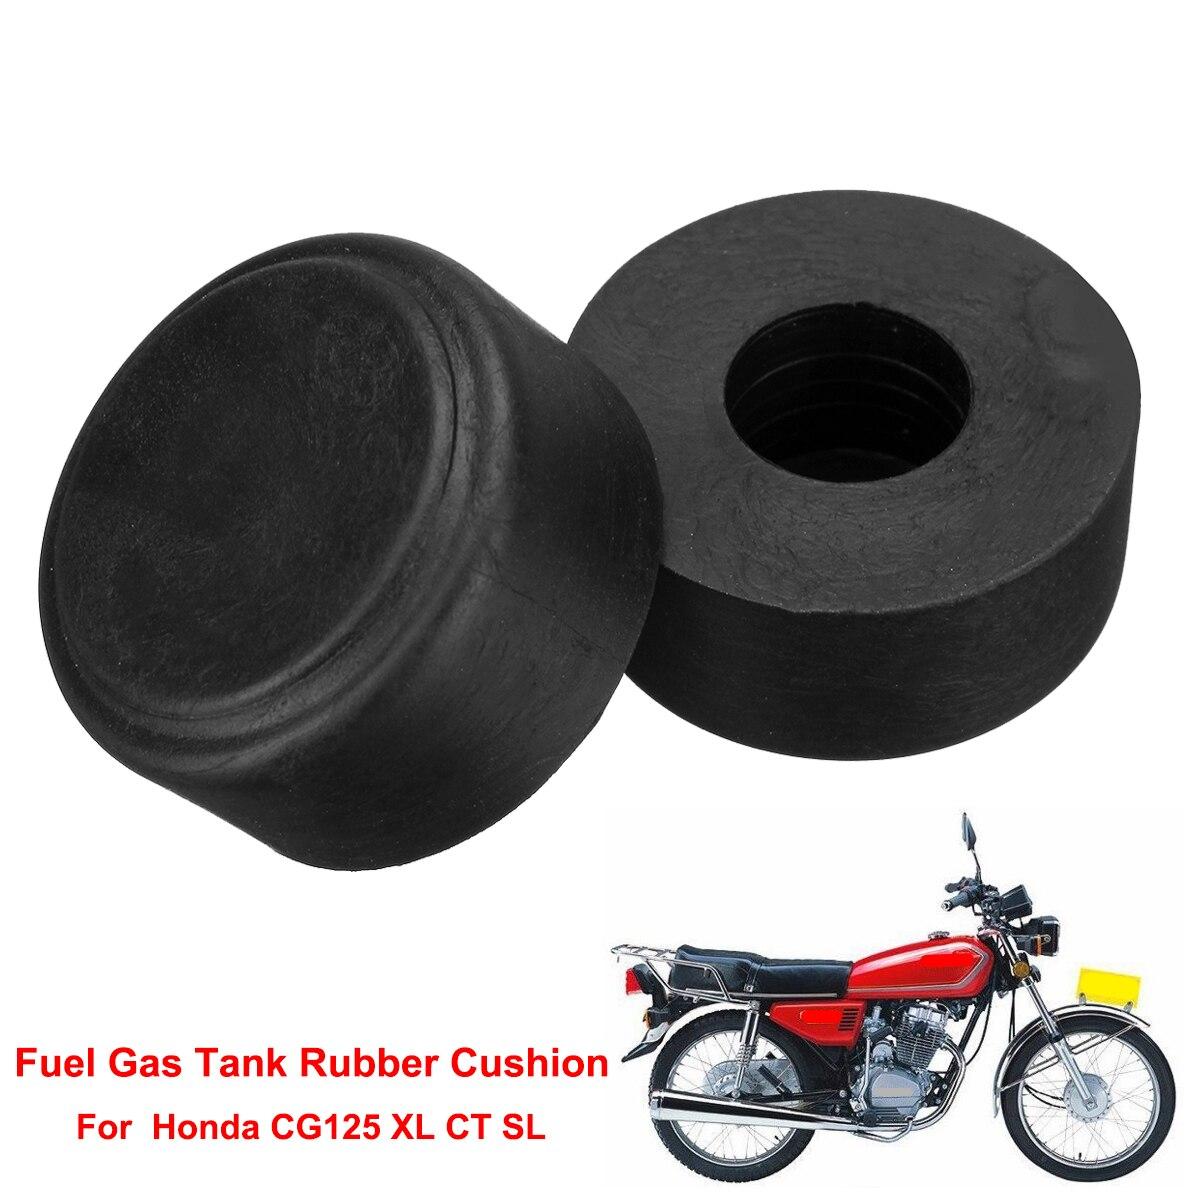 Black Oil Fuel Tank Rubber Mount Cushion Kit for Honda CG125 CG 125 Motorbikes